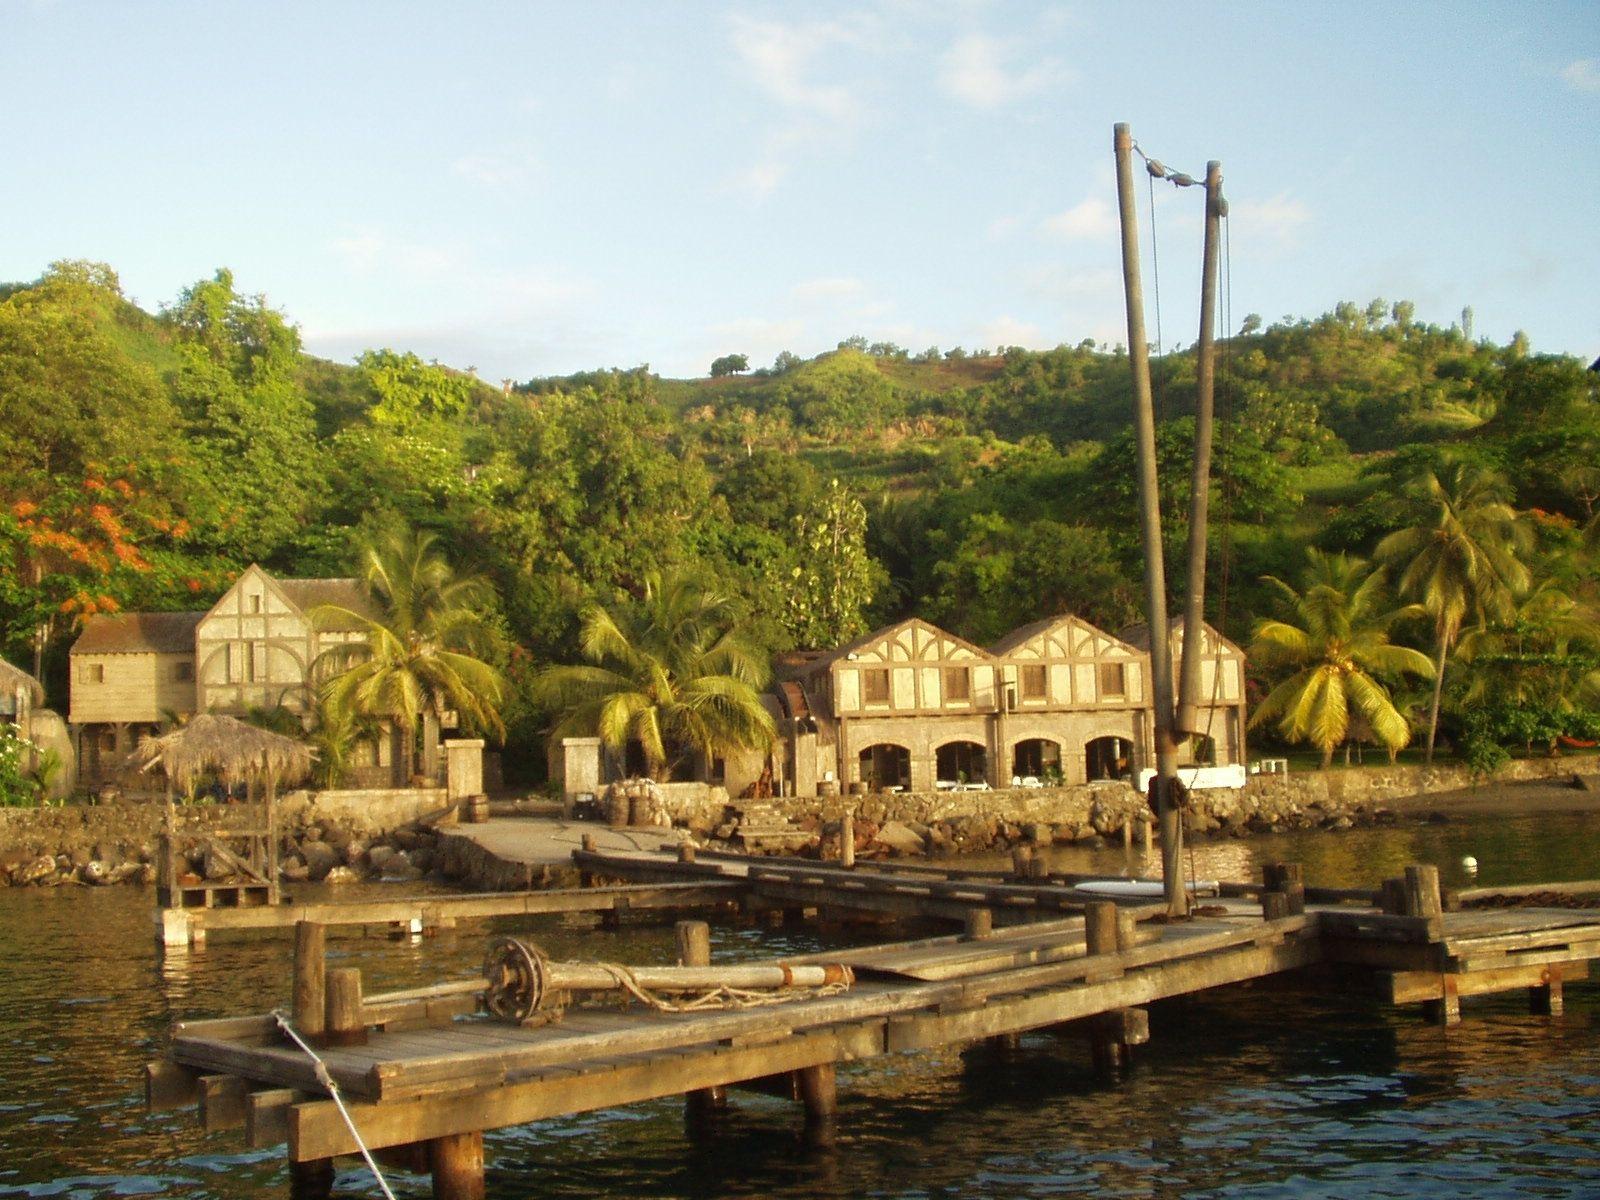 Pirates Of The Caribbean Movie Set On St Vincint Jpg 1600 1200 Saint Vincent And The Grenadines Caribbean Movie Sets